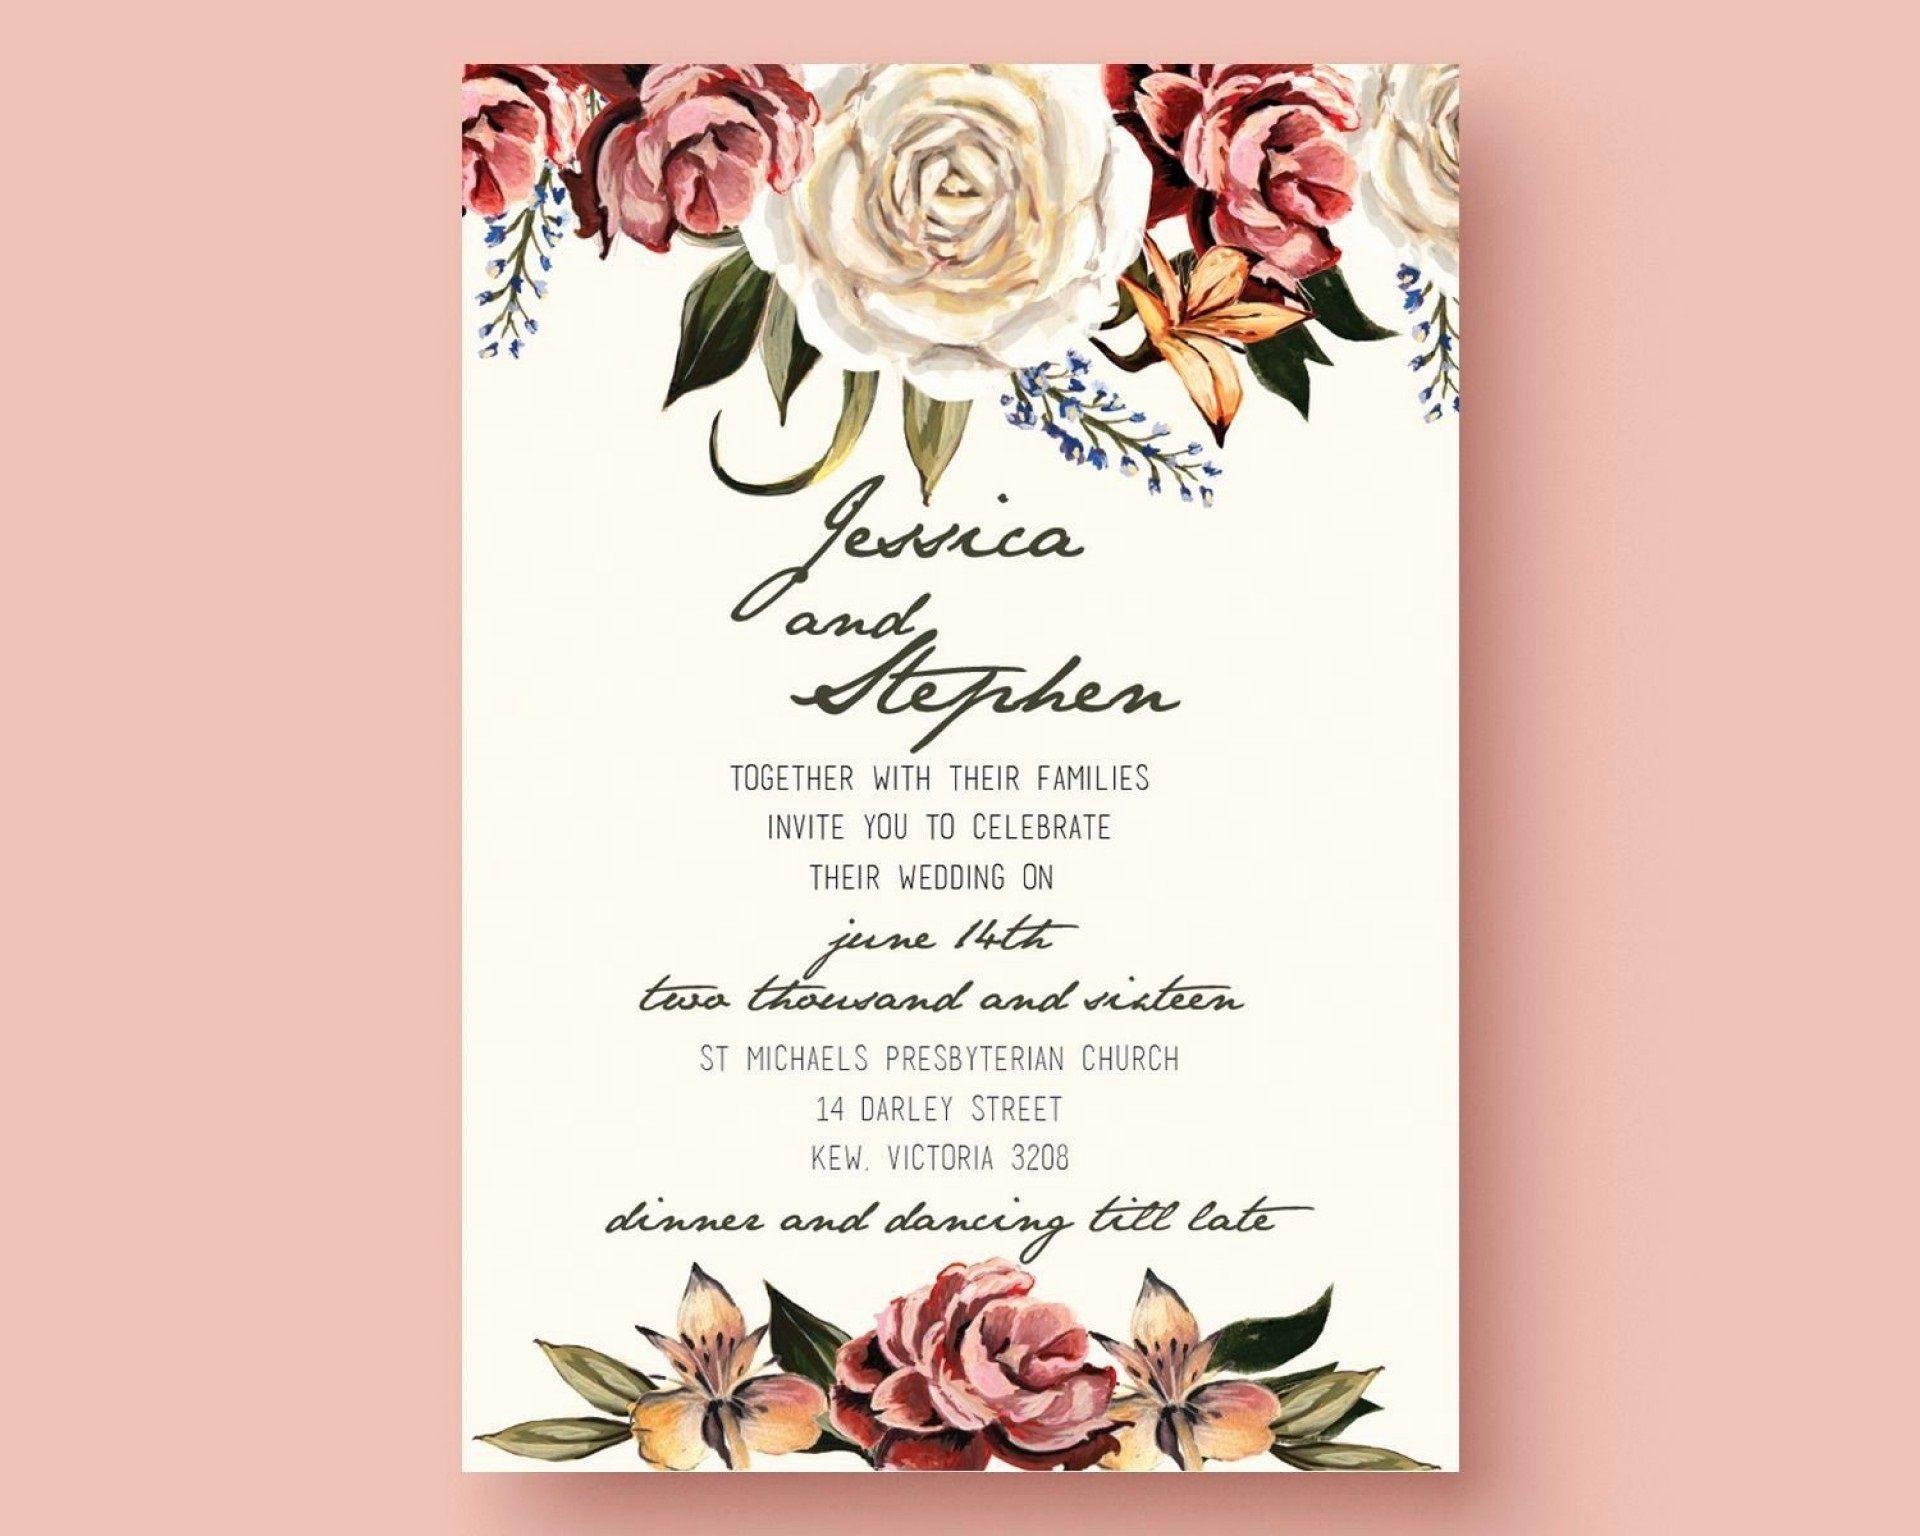 005 Dreaded Microsoft Word Wedding Invitation Template Free Download High Resolution  M EditableFull